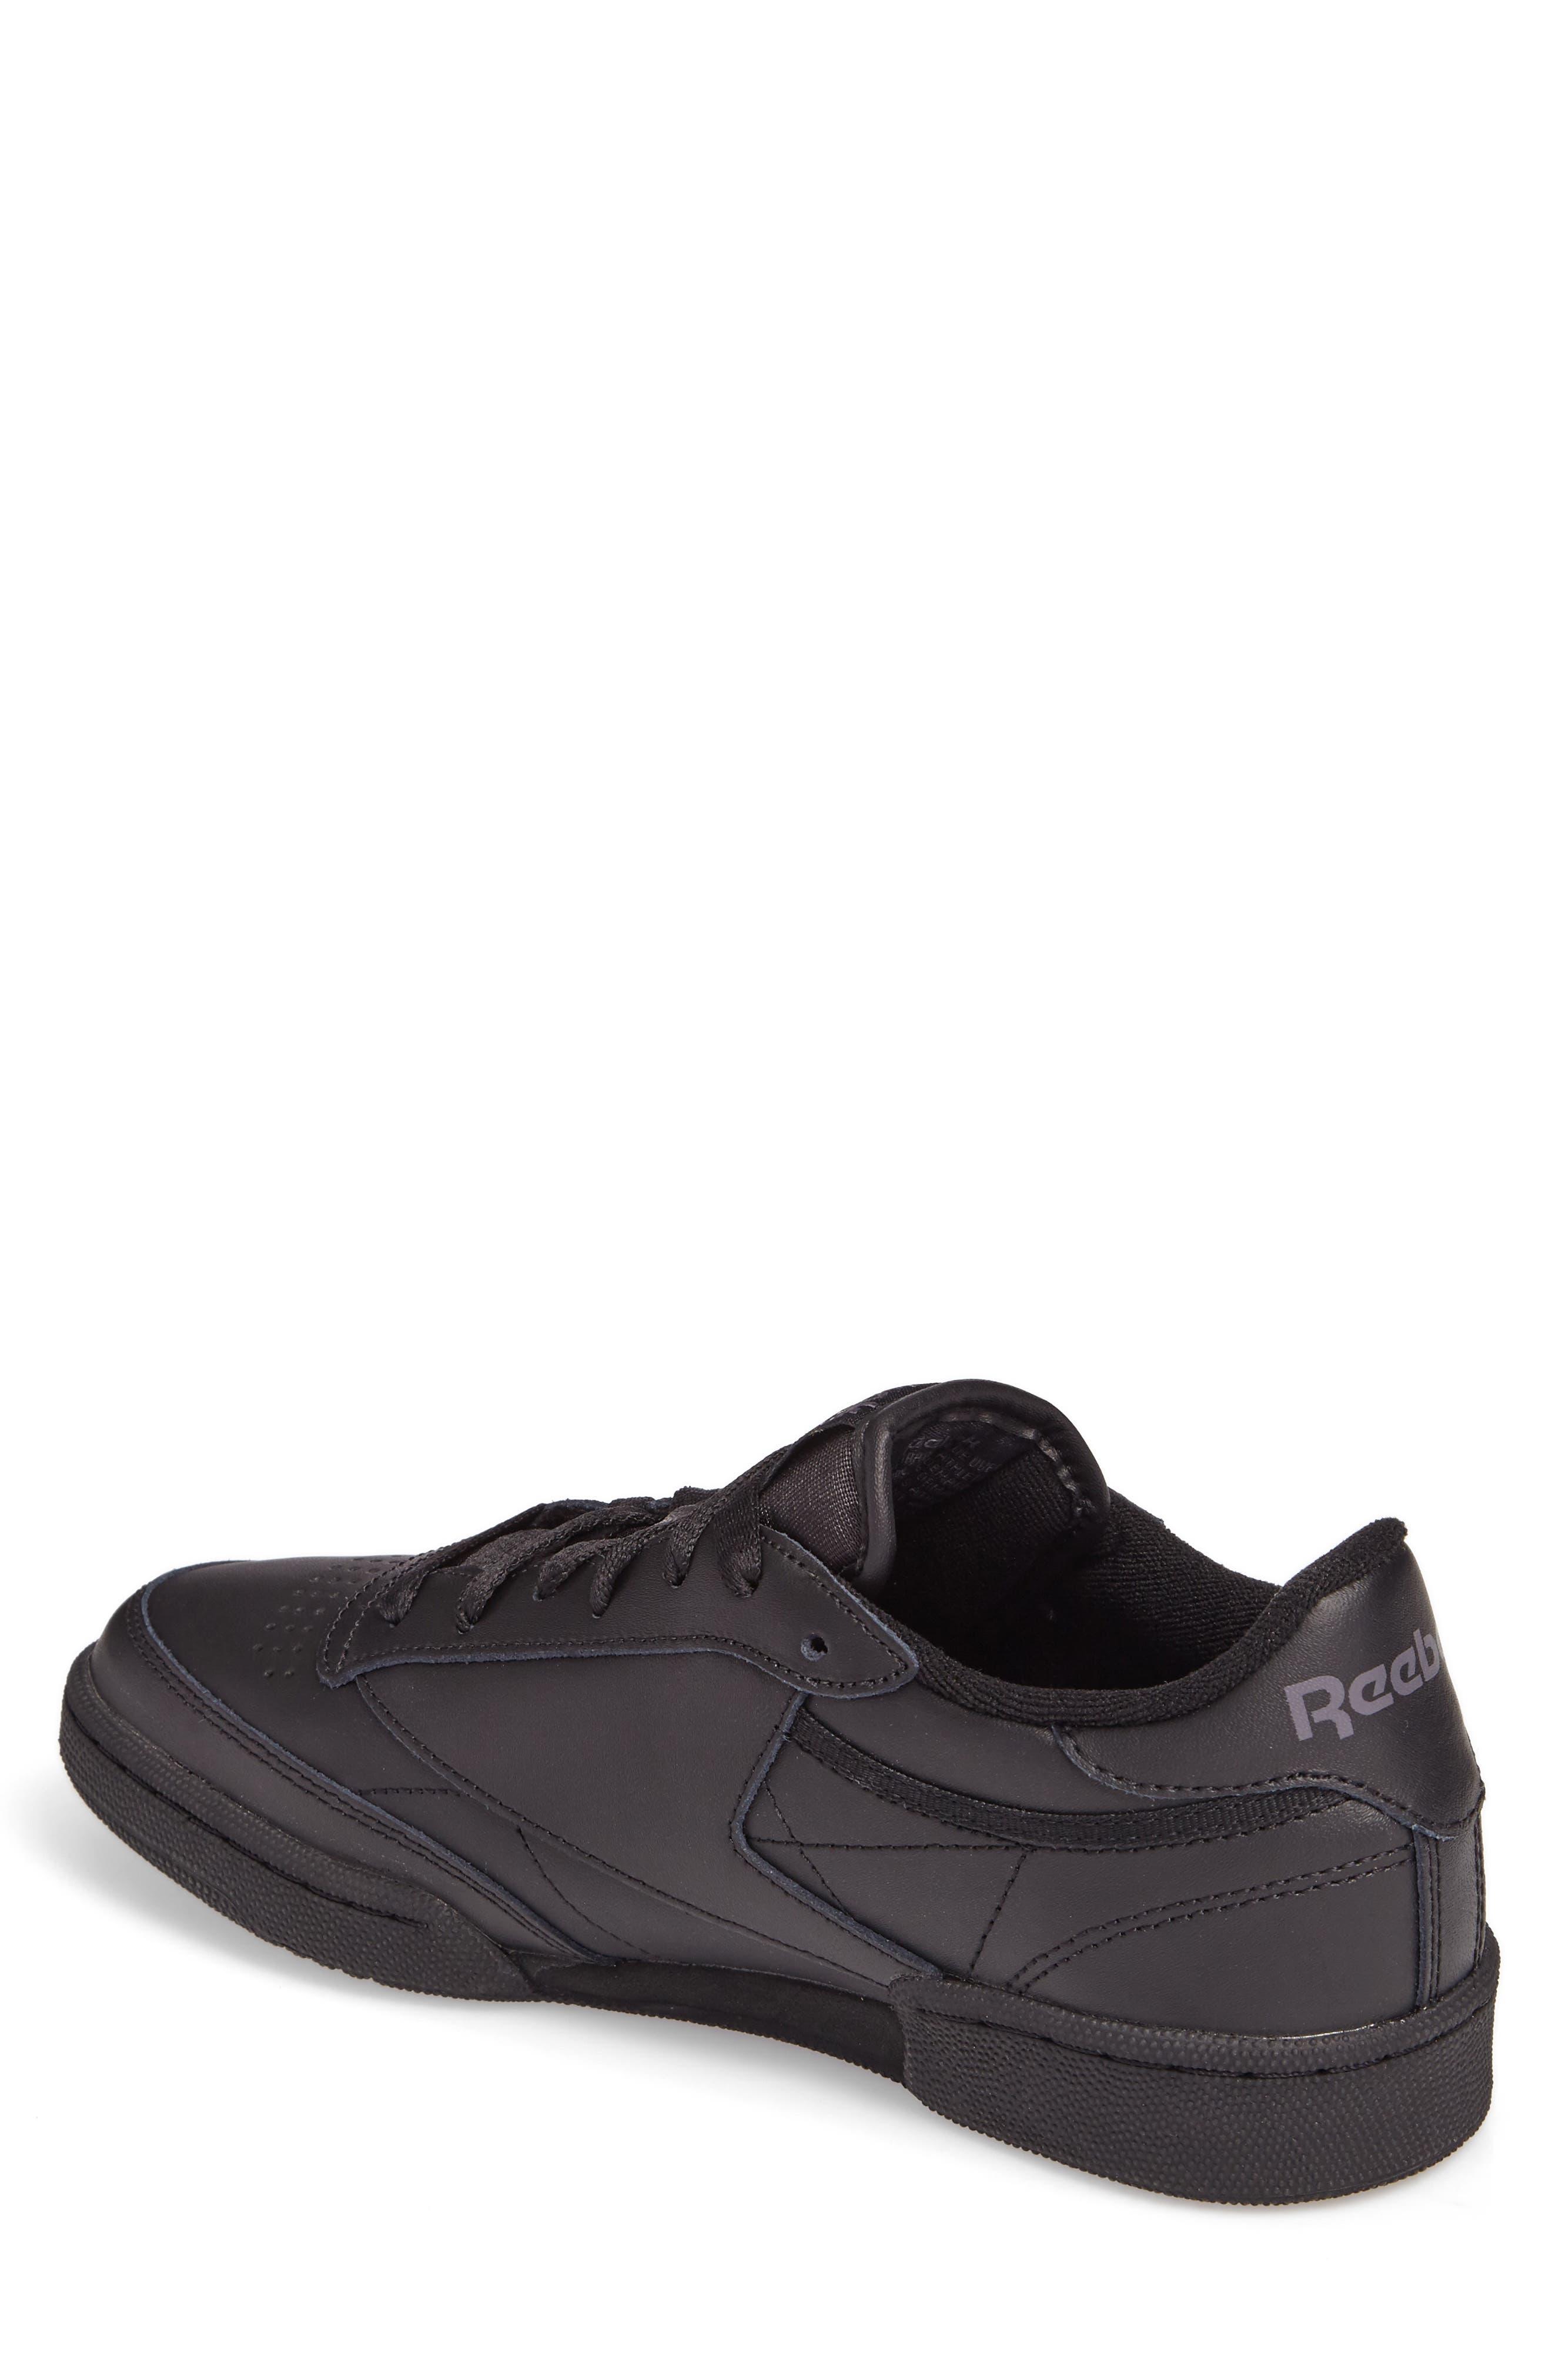 Alternate Image 2  - Reebok Club C 85 Sneaker (Men)